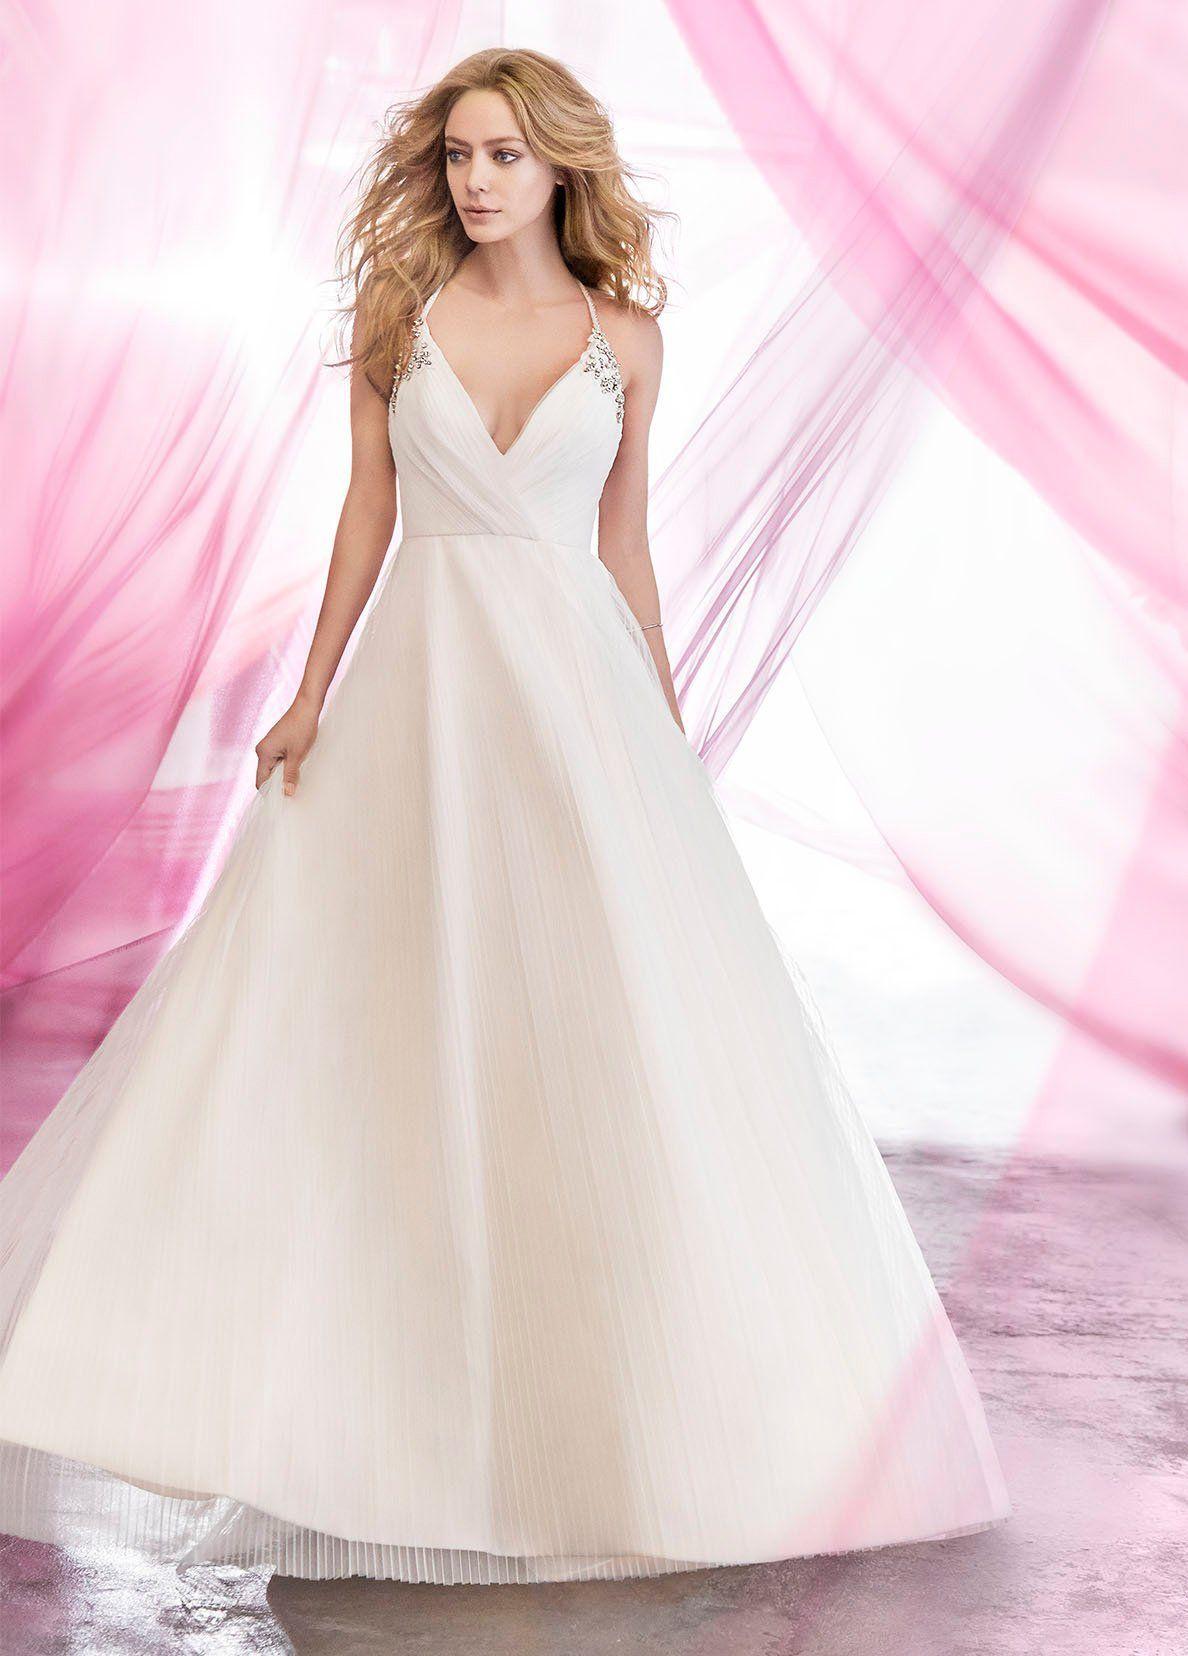 Blush by Hayley Paige Cosmos Aline wedding dress